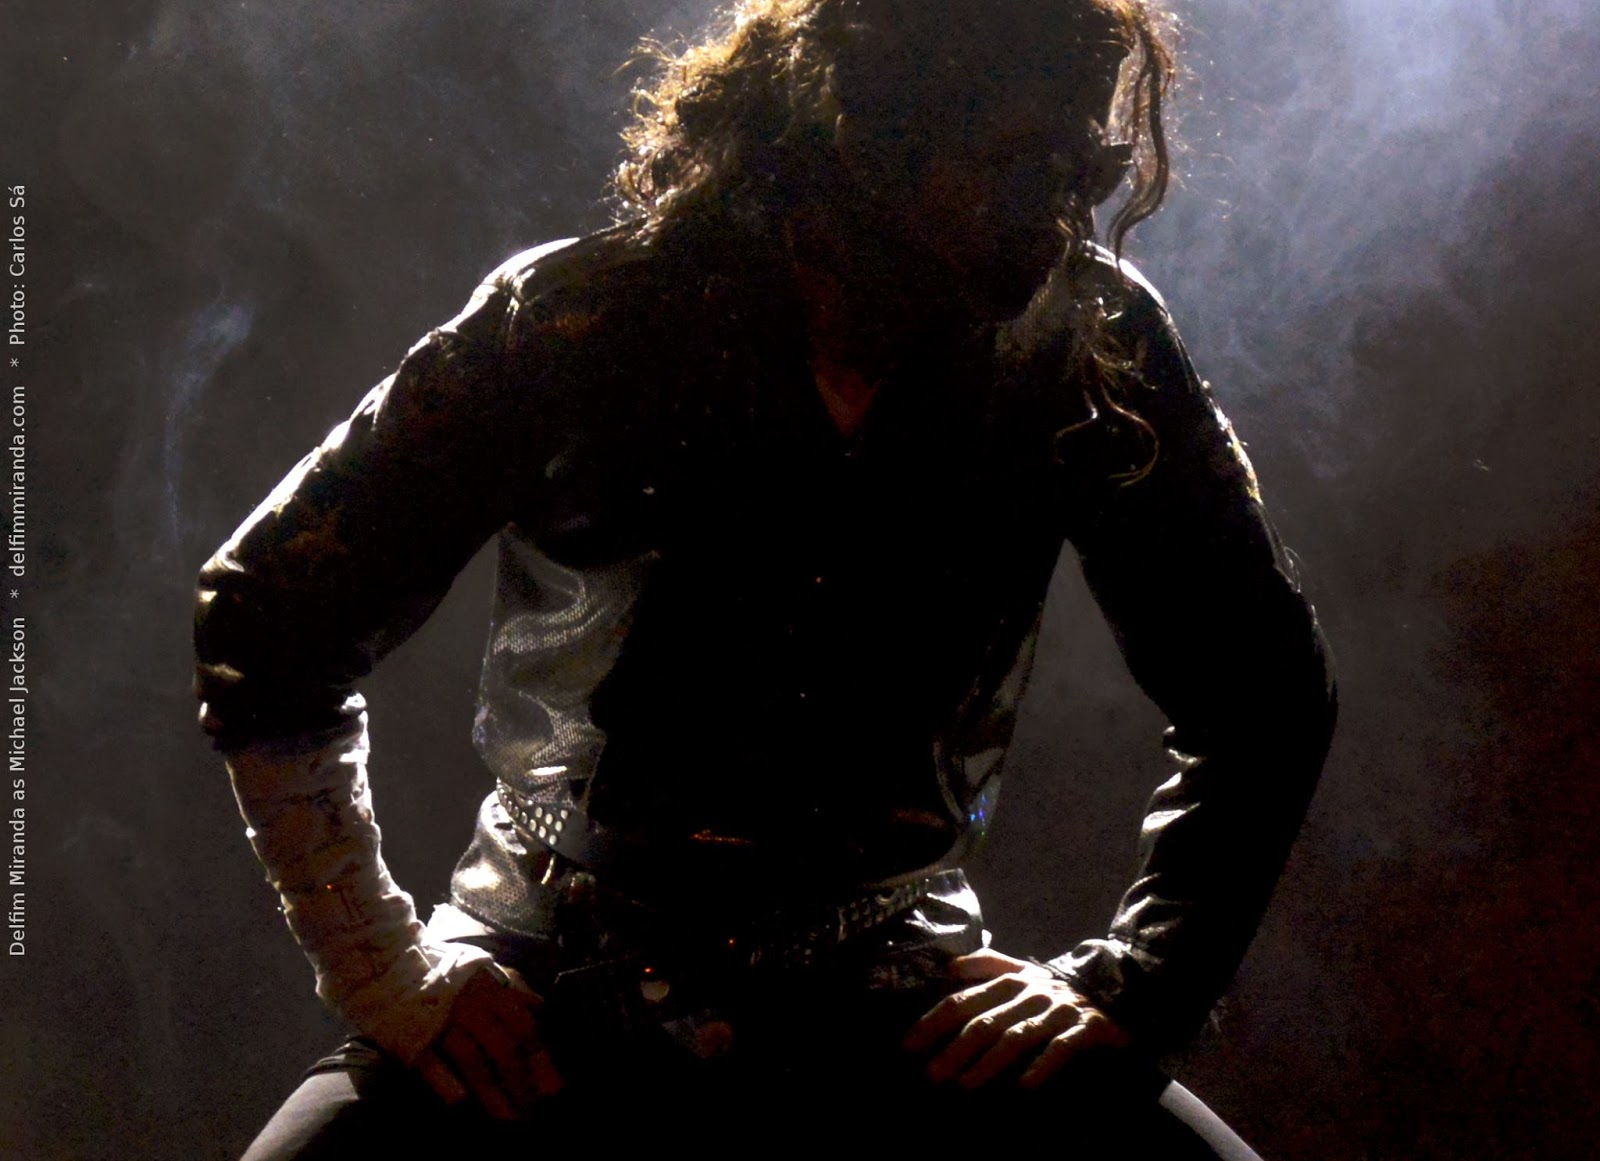 Delfim Miranda - Michael Jackson Tribute - In the shadow